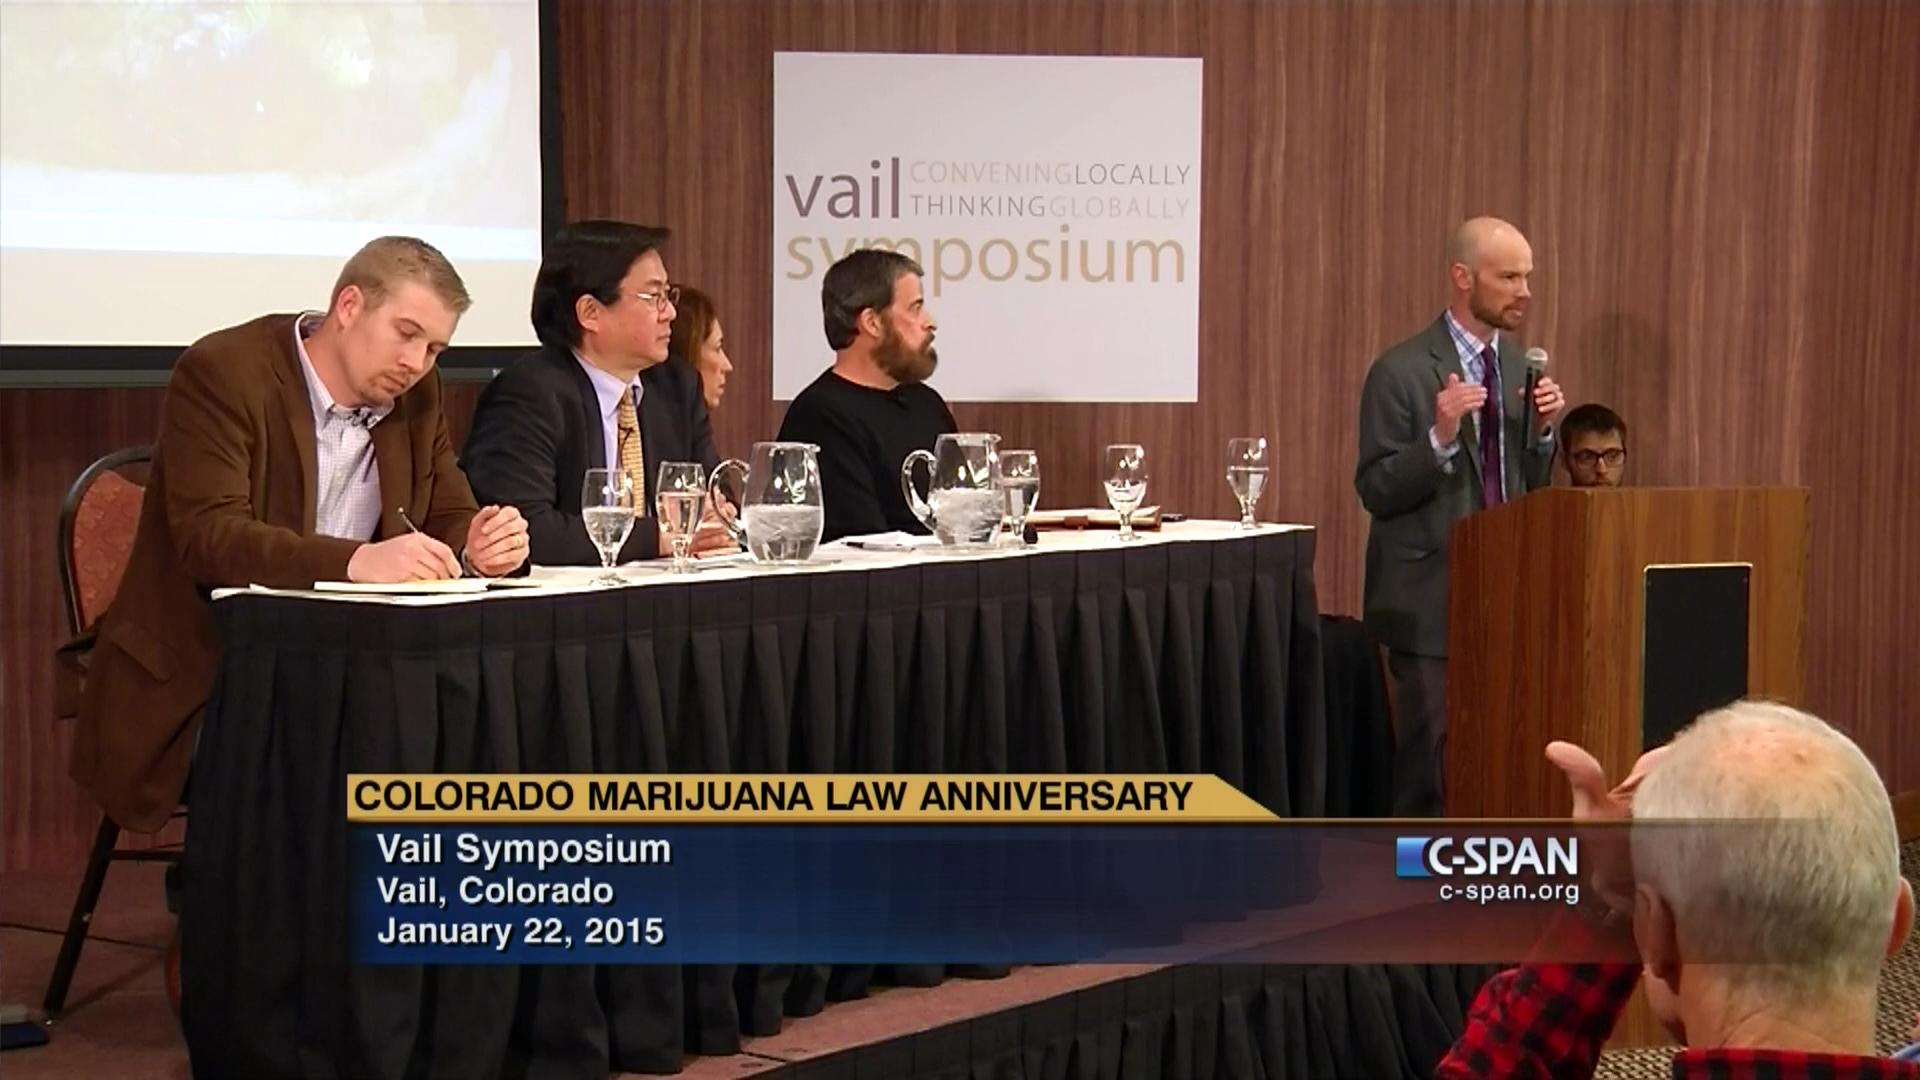 Discussion Anniversary Colorado's Marijuana Law, Jan 22 2015   Video    C-SPAN.org